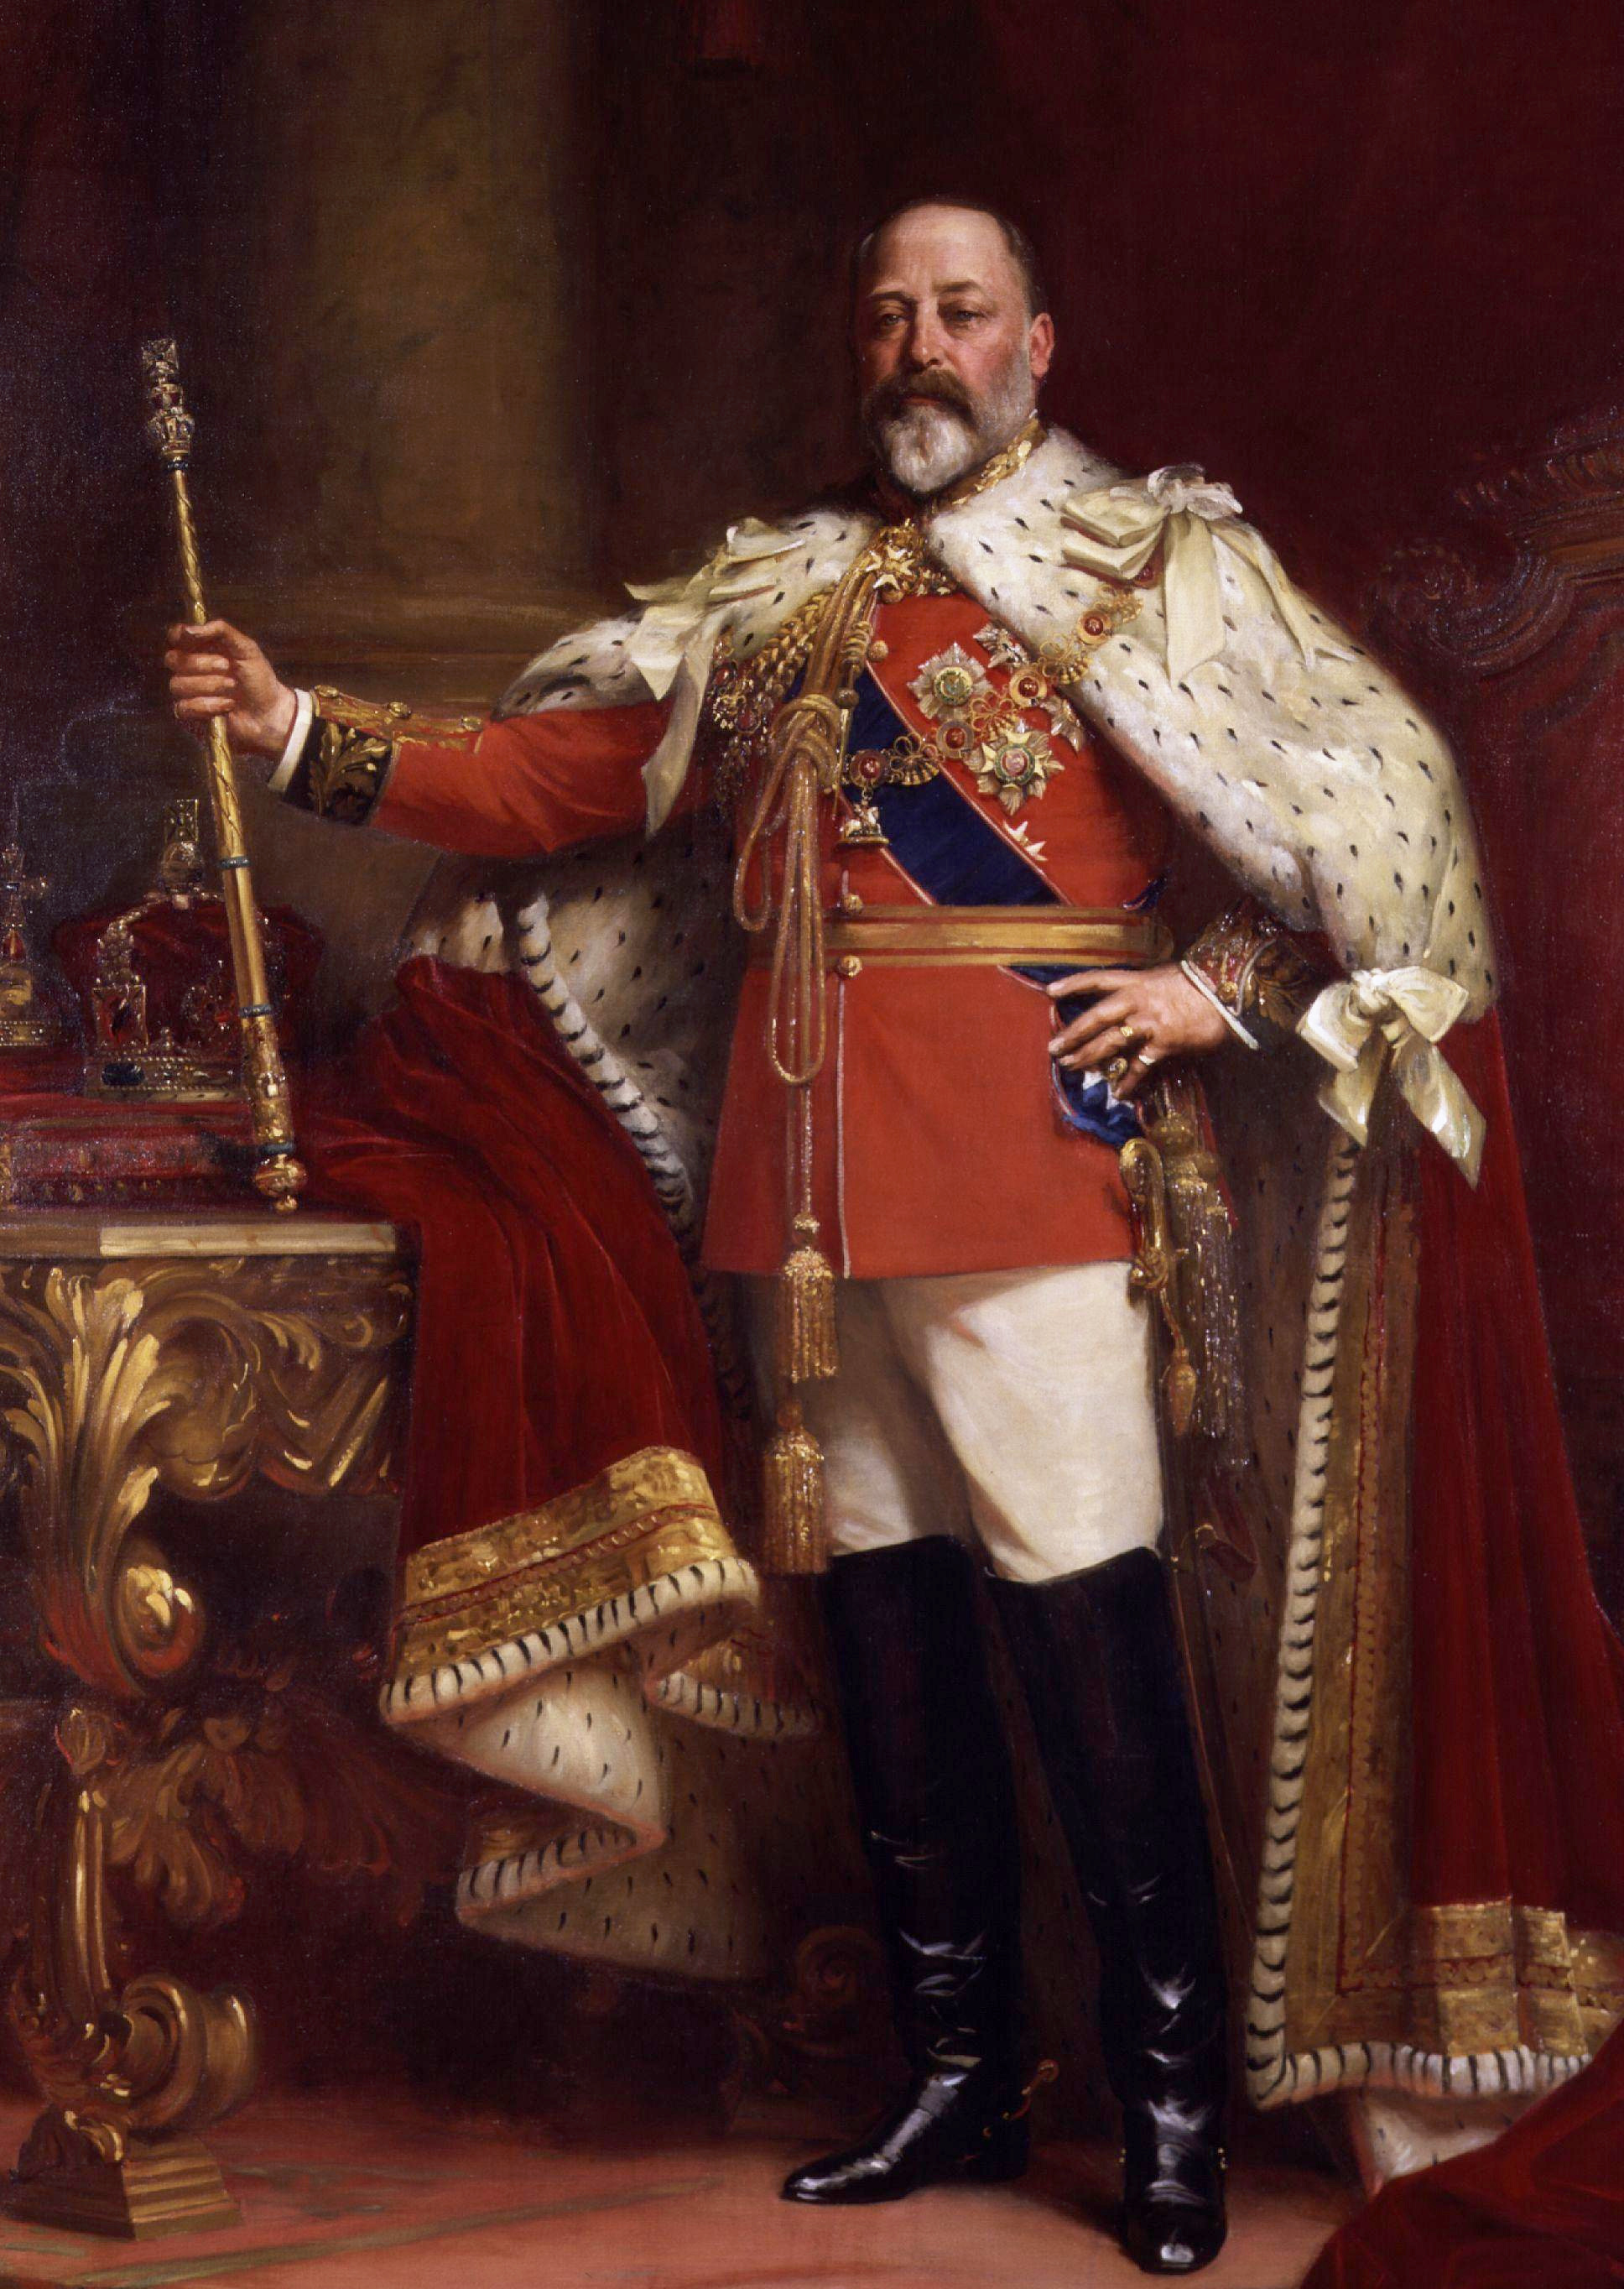 Depiction of Eduardo VII del Reino Unido